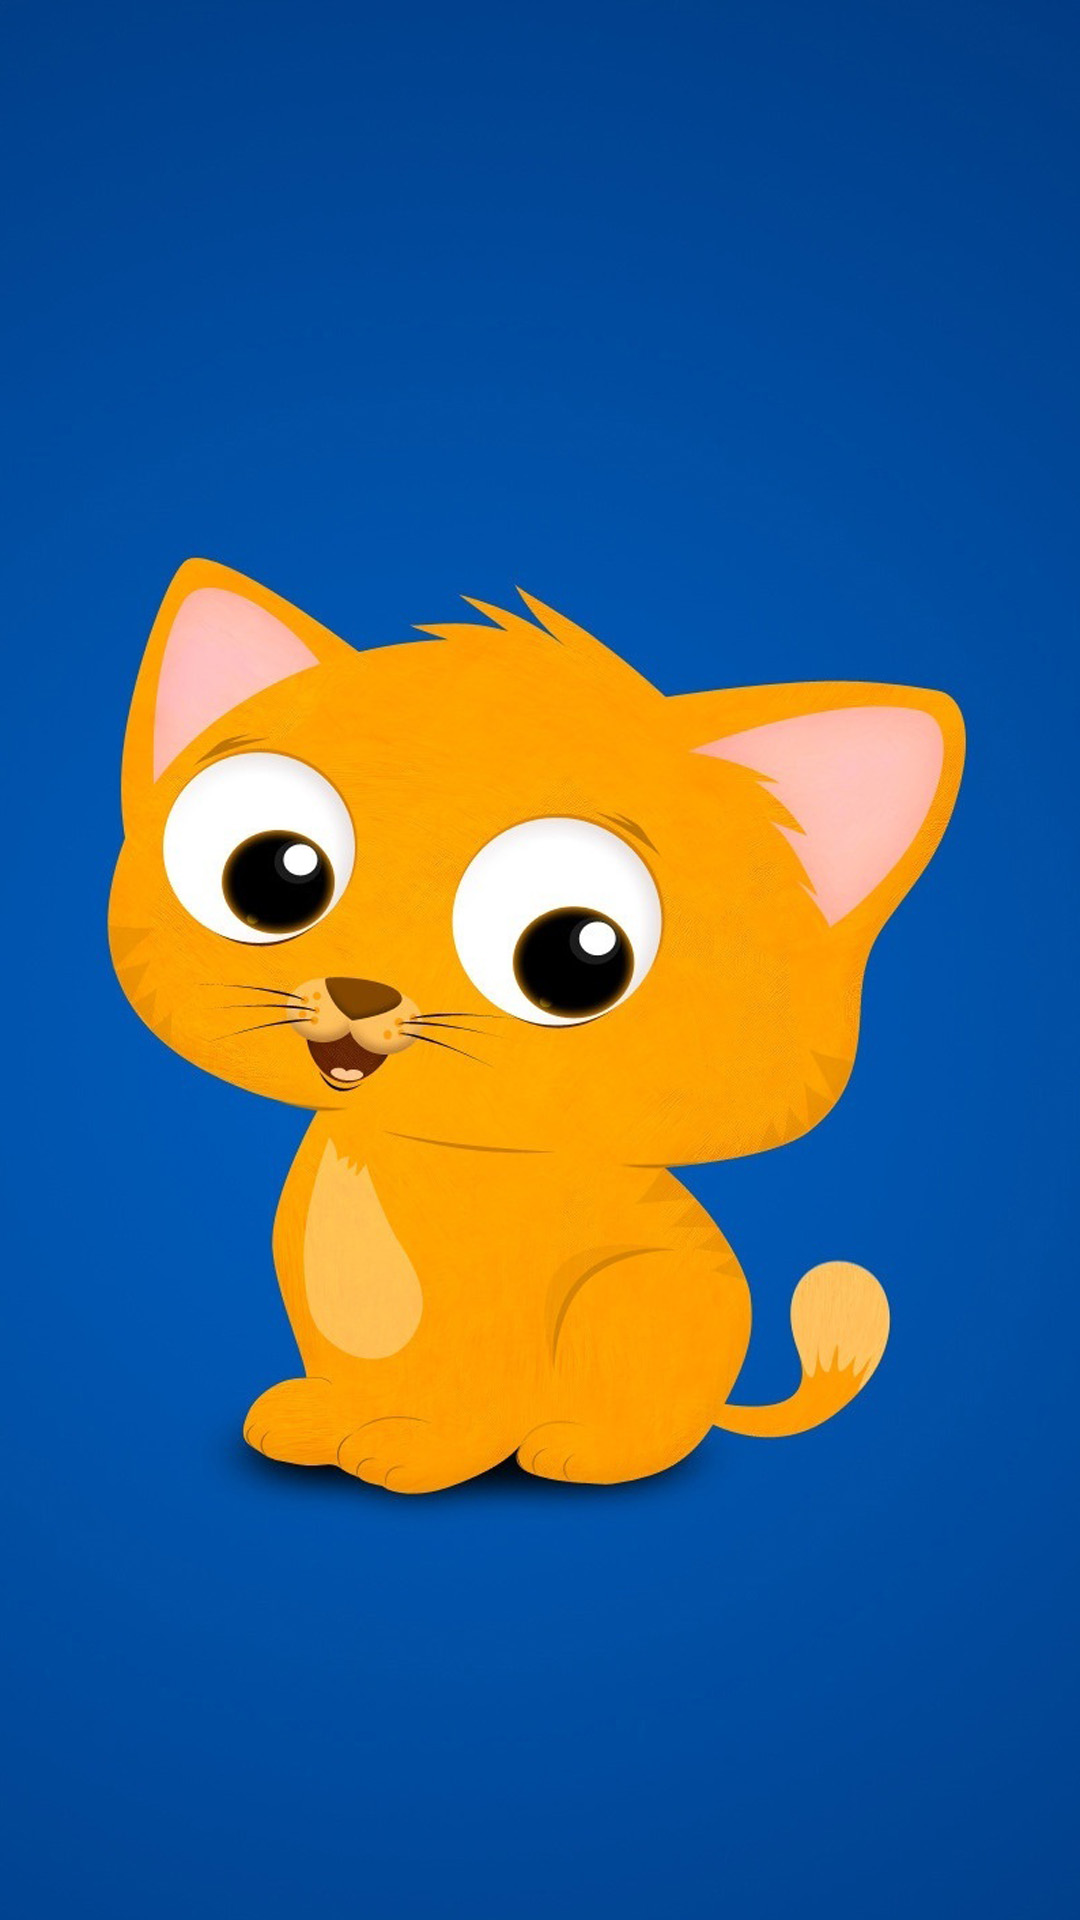 Cartoon Kitten Wallpaper Cartoon Wallpaper For Mobile 2401662 Hd Wallpaper Backgrounds Download